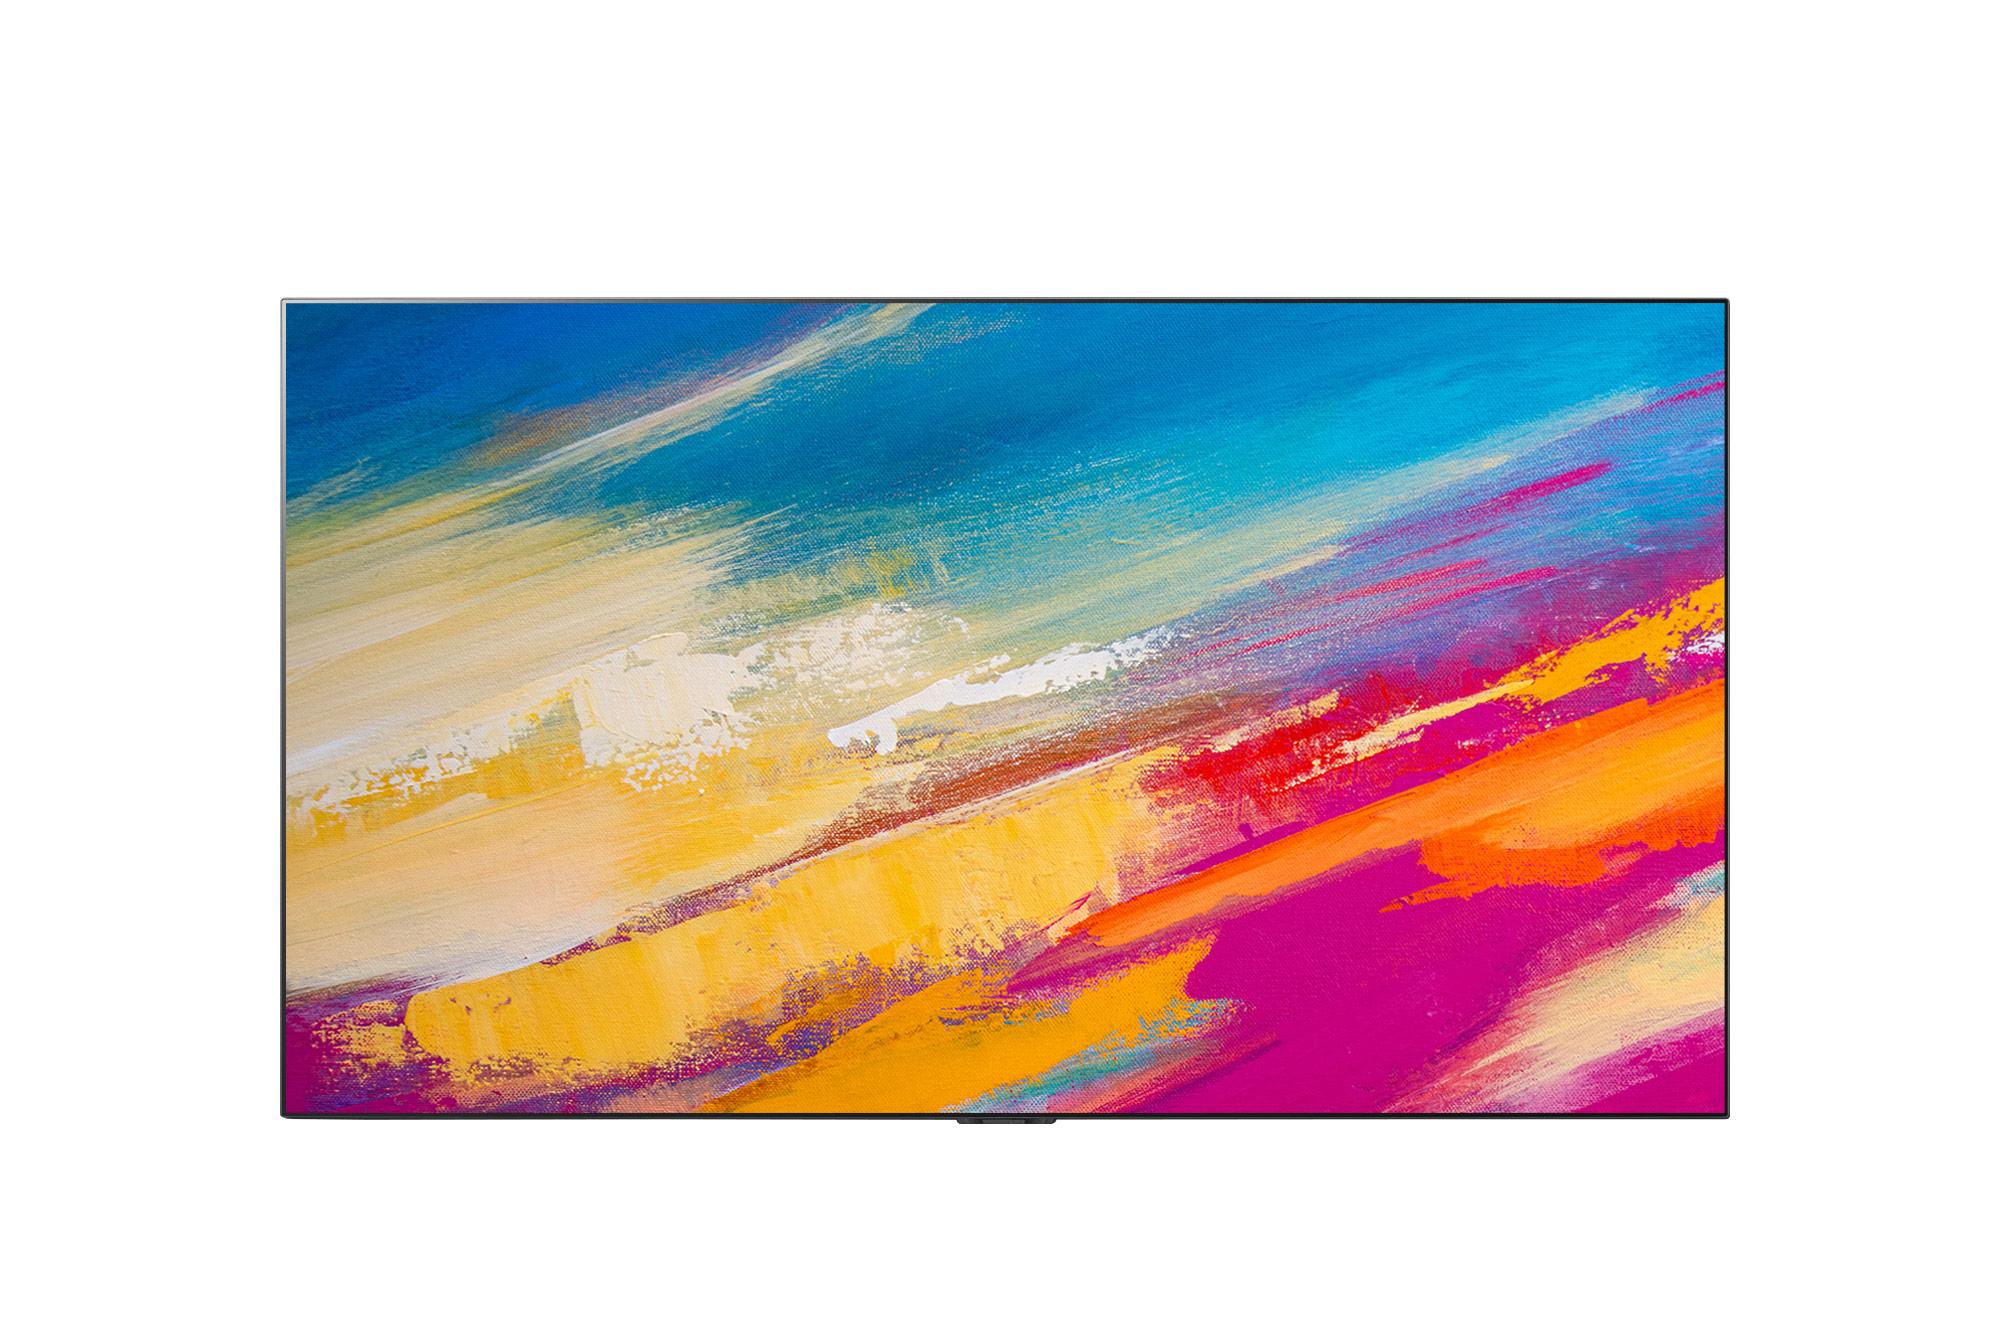 LG Pro:Centric SMART 65WS960H (EU) 1